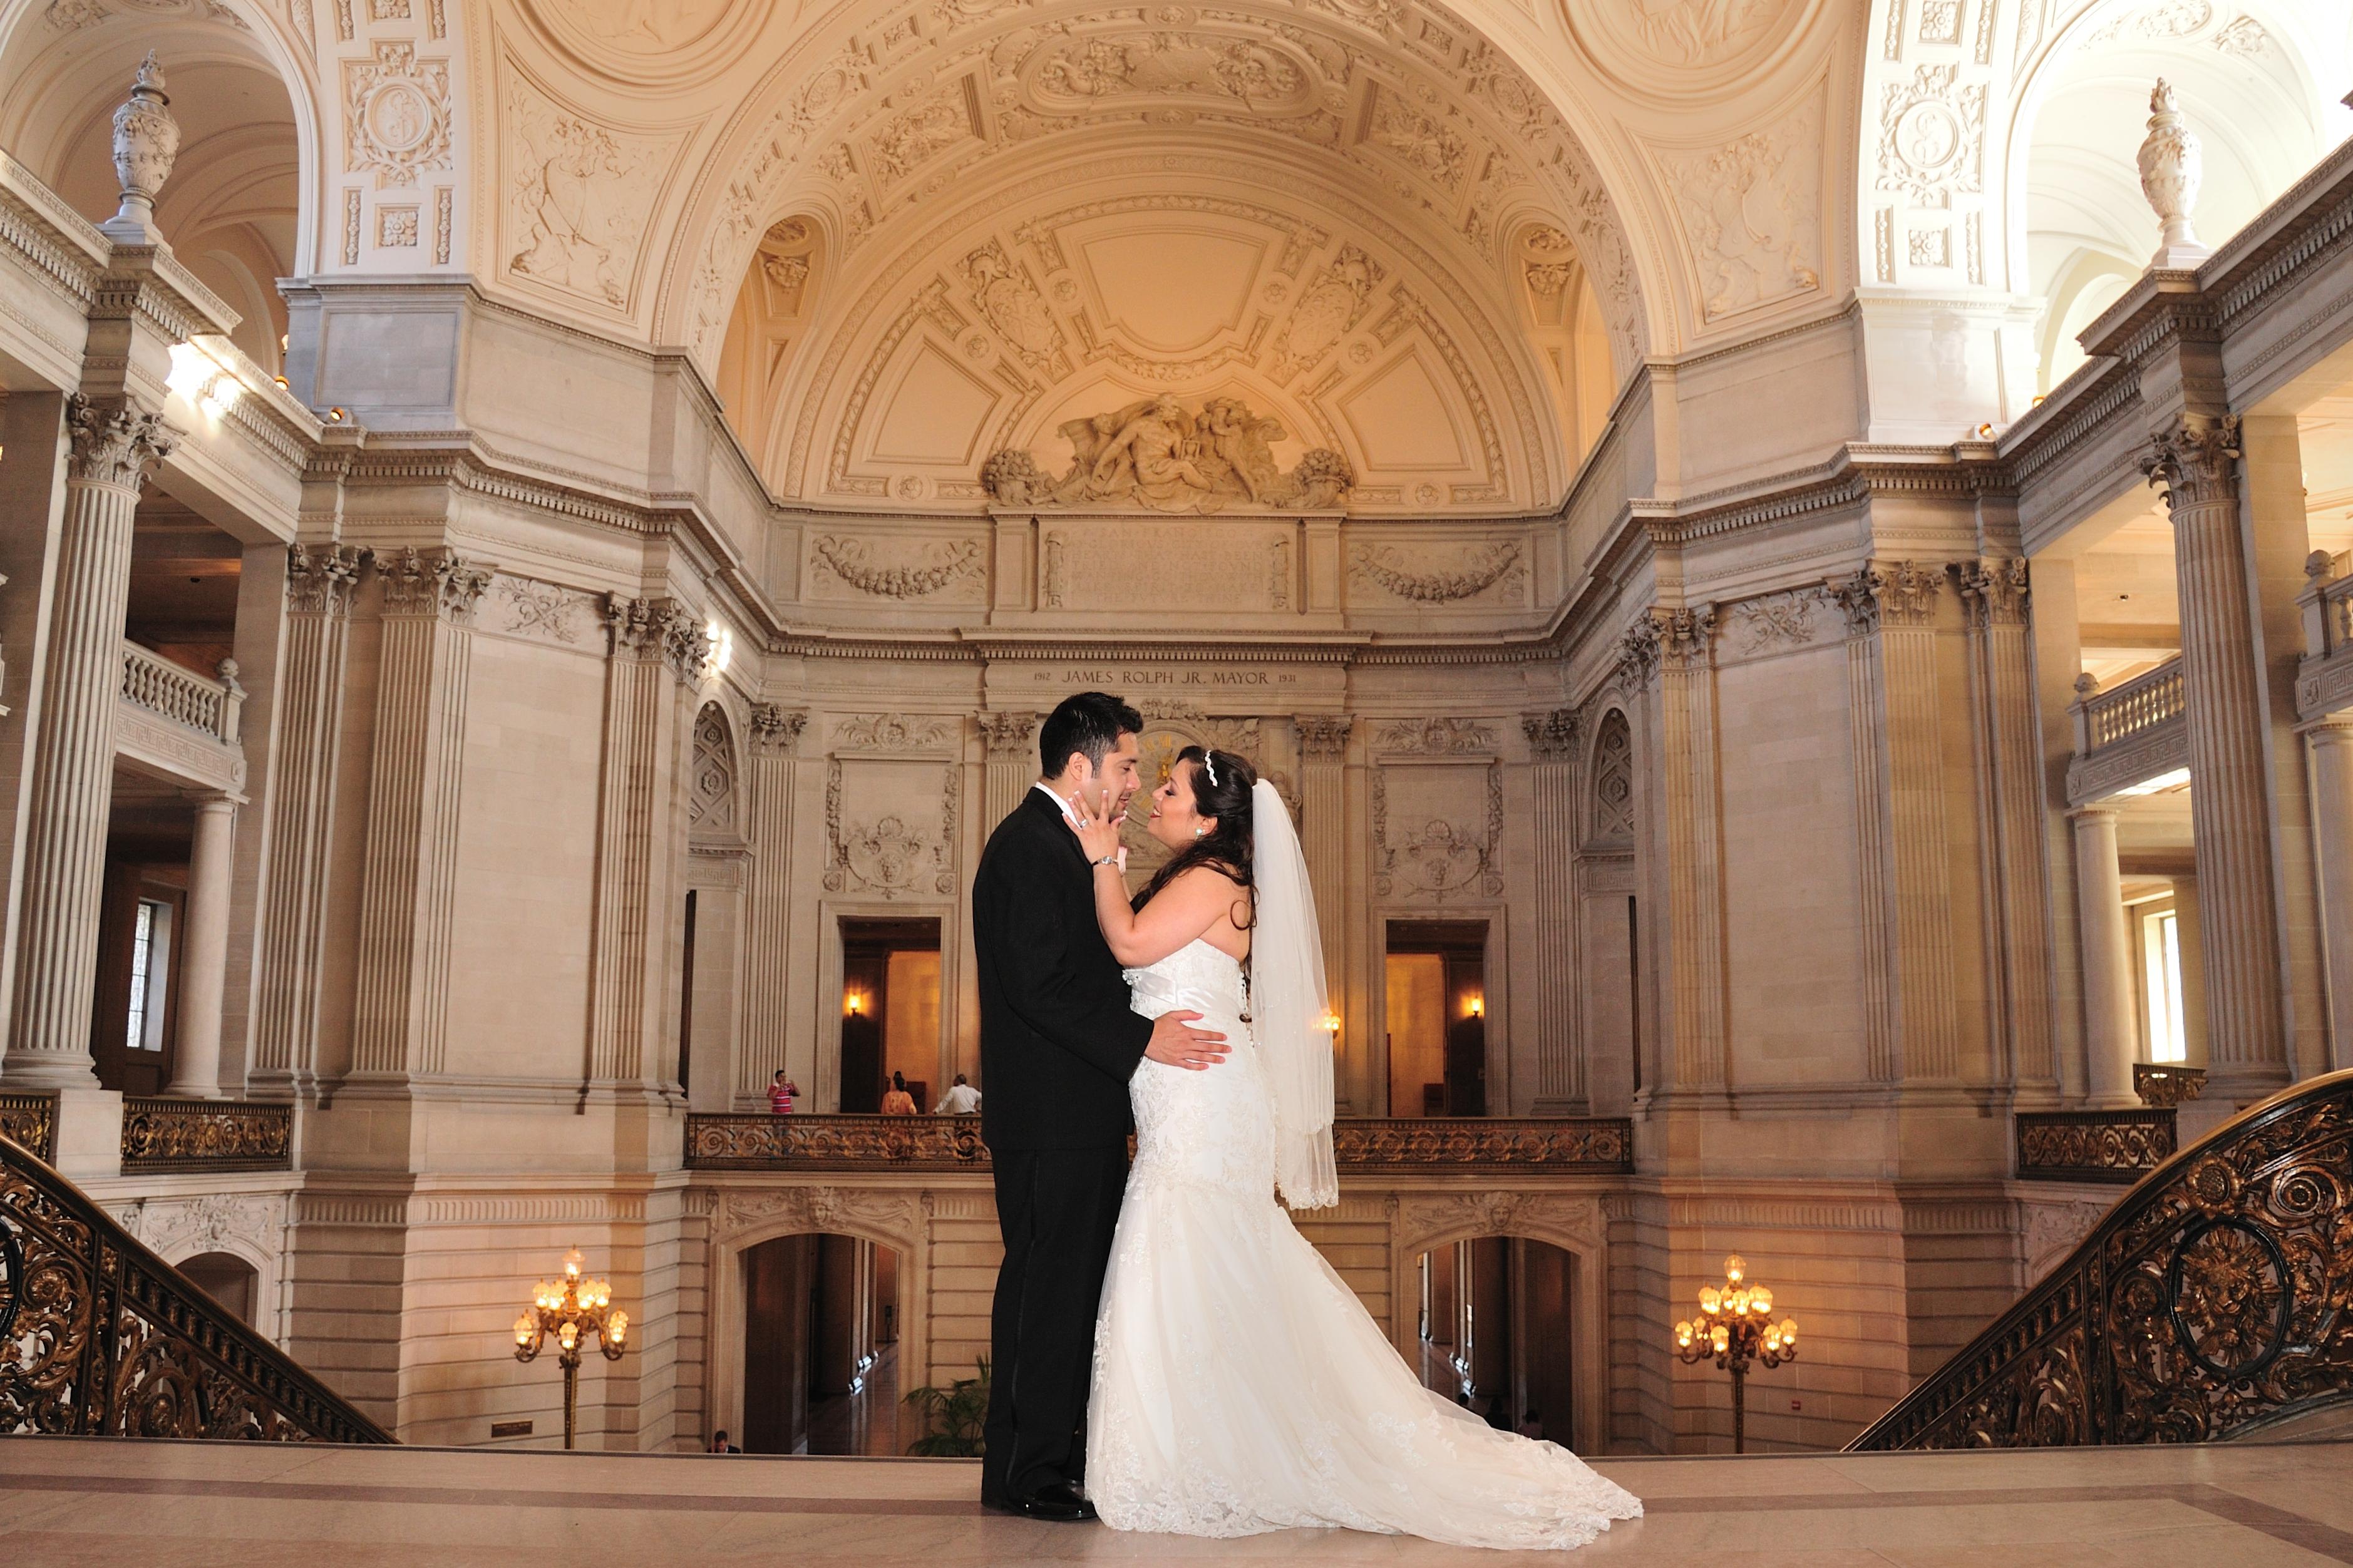 Wedding at city hall photo